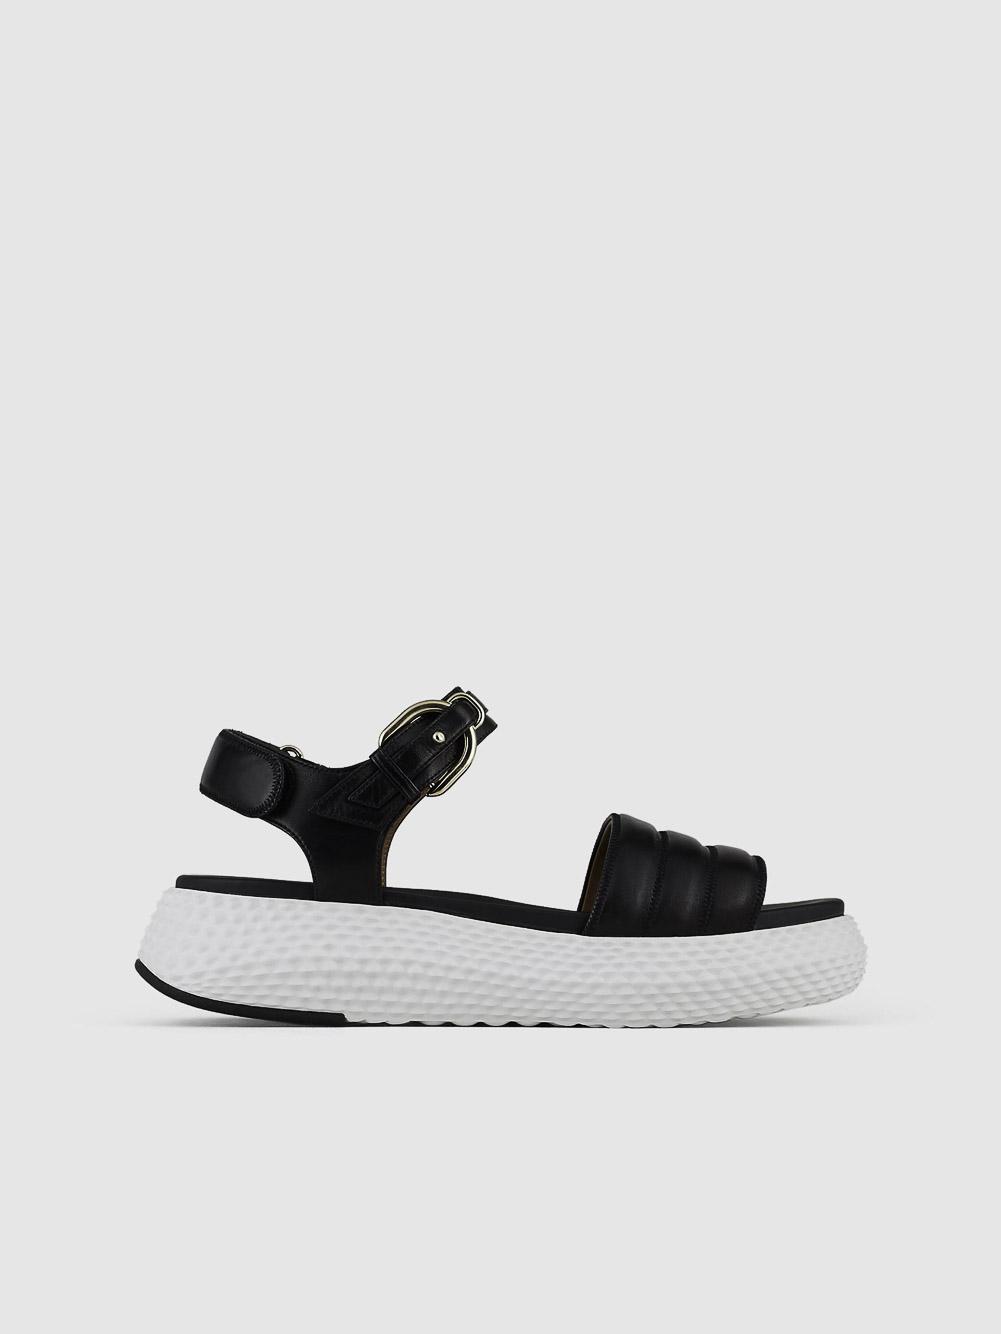 EMPORIO ARMANI Παπούτσια πέδιλα X3U095XL369-A083 ΜΑΥΡΟ